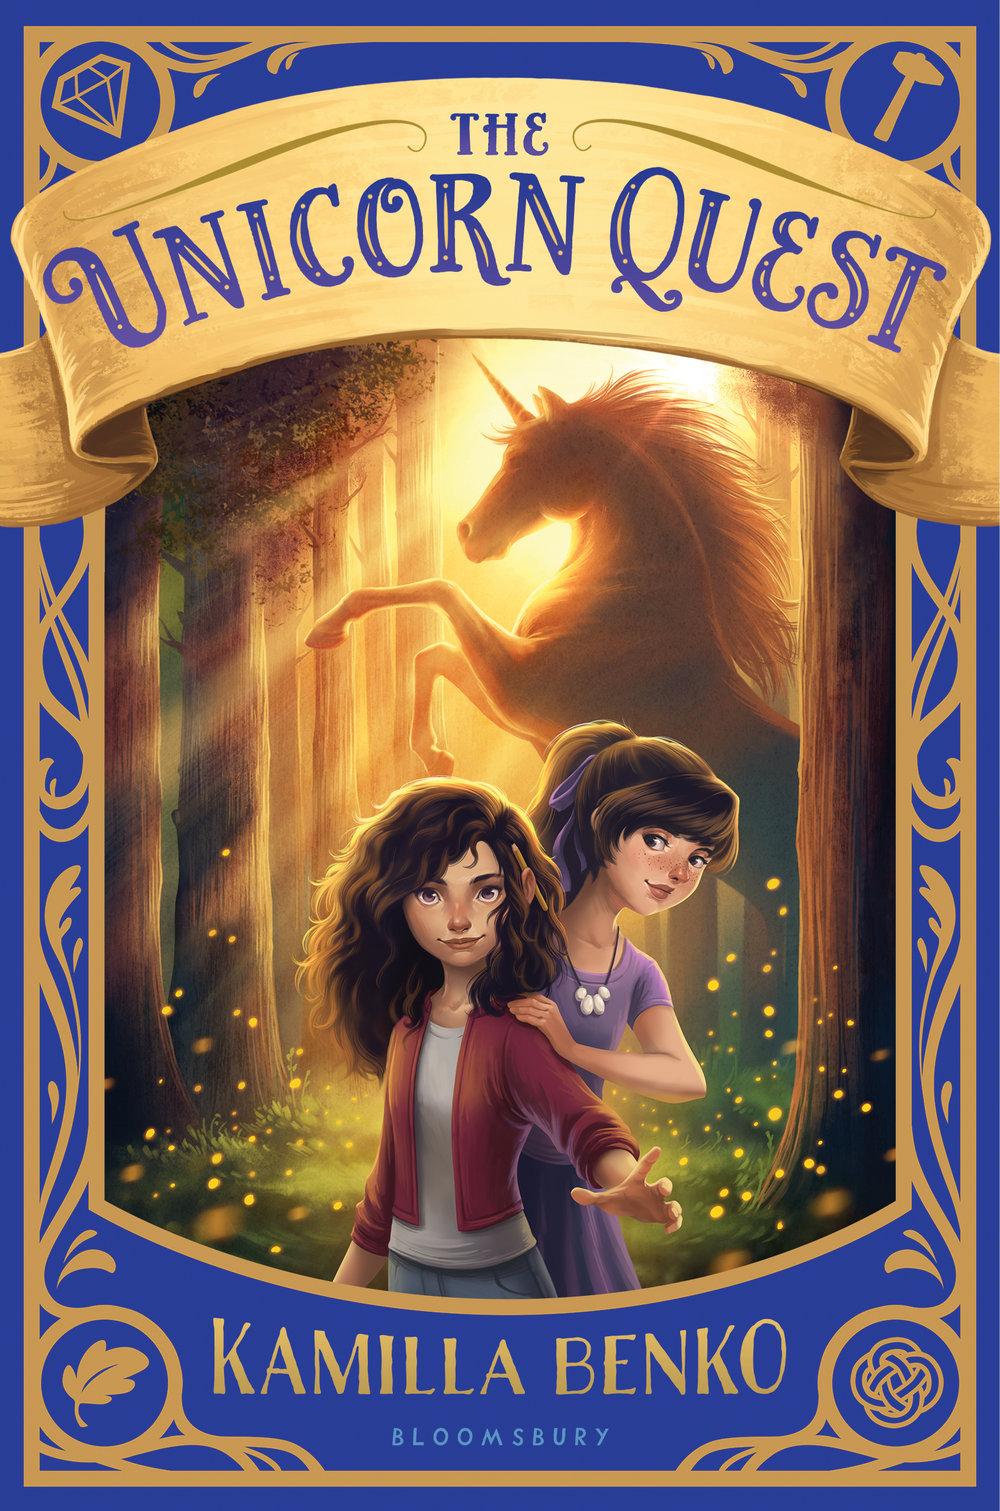 Benko_Final Cover_ The Unicorn Quest.jpg